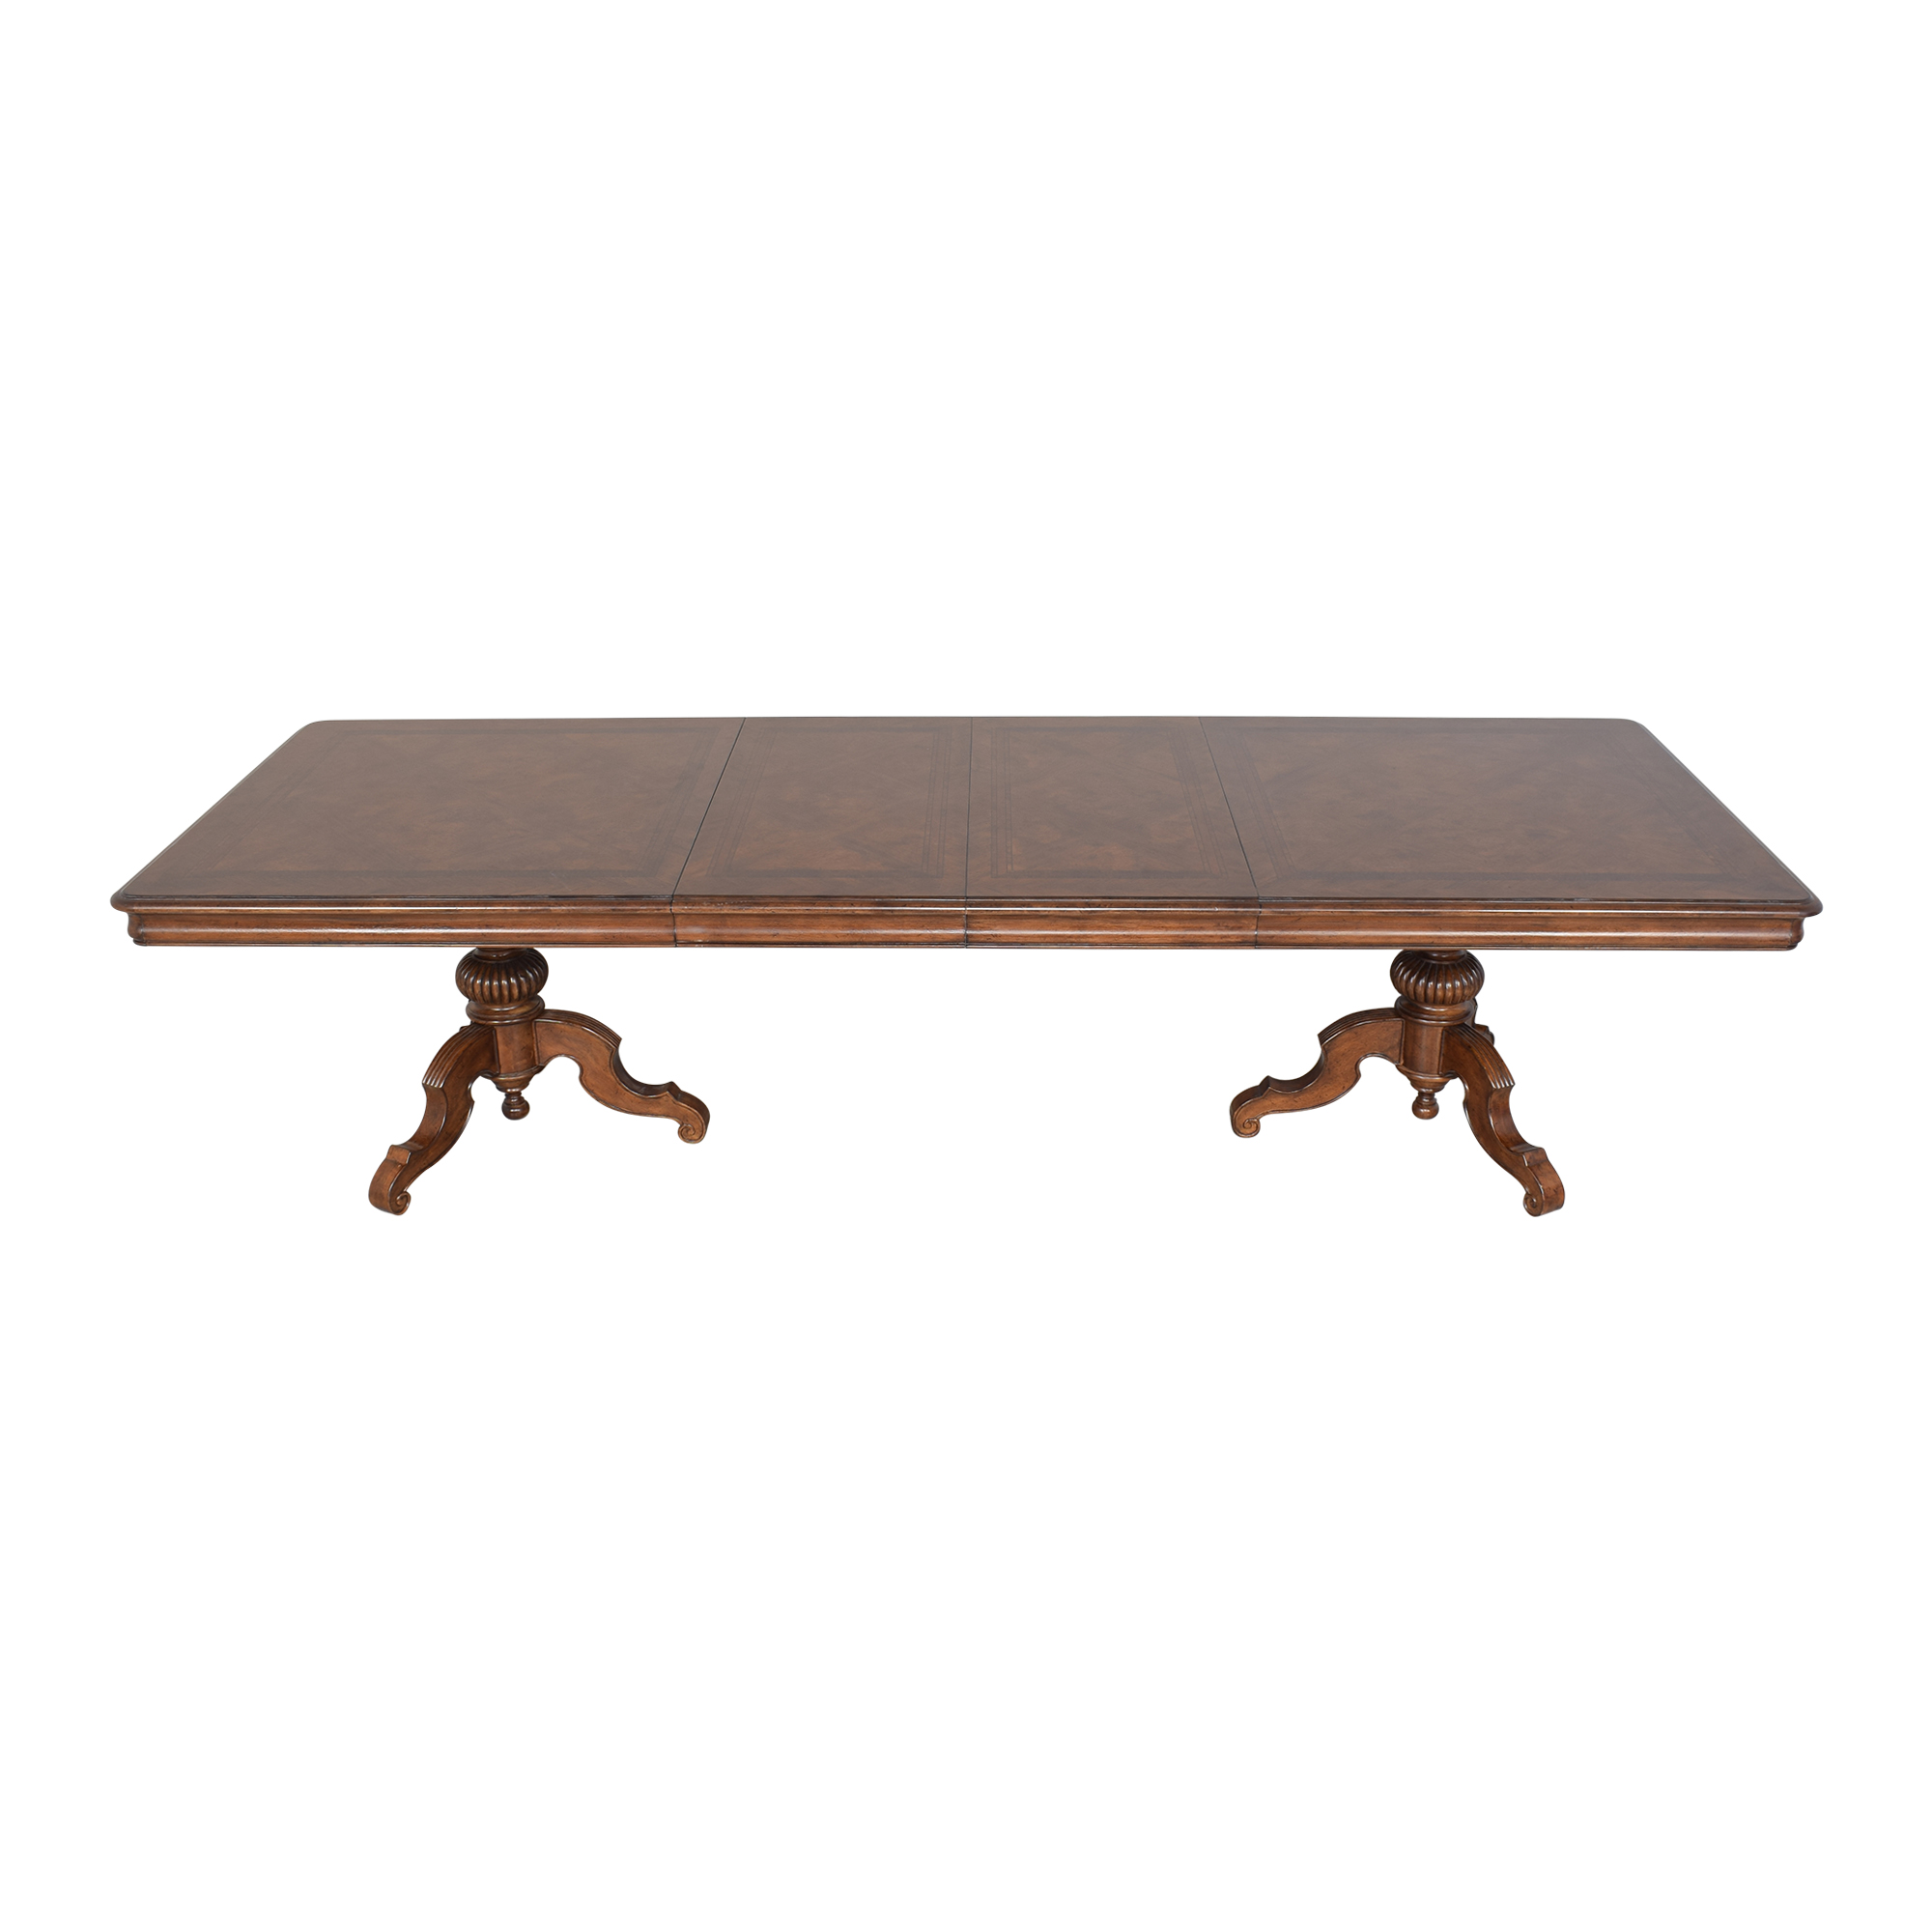 buy Thomasville Ernest Hemingway Castillian Double Pedestal Dining Table Thomasville Tables